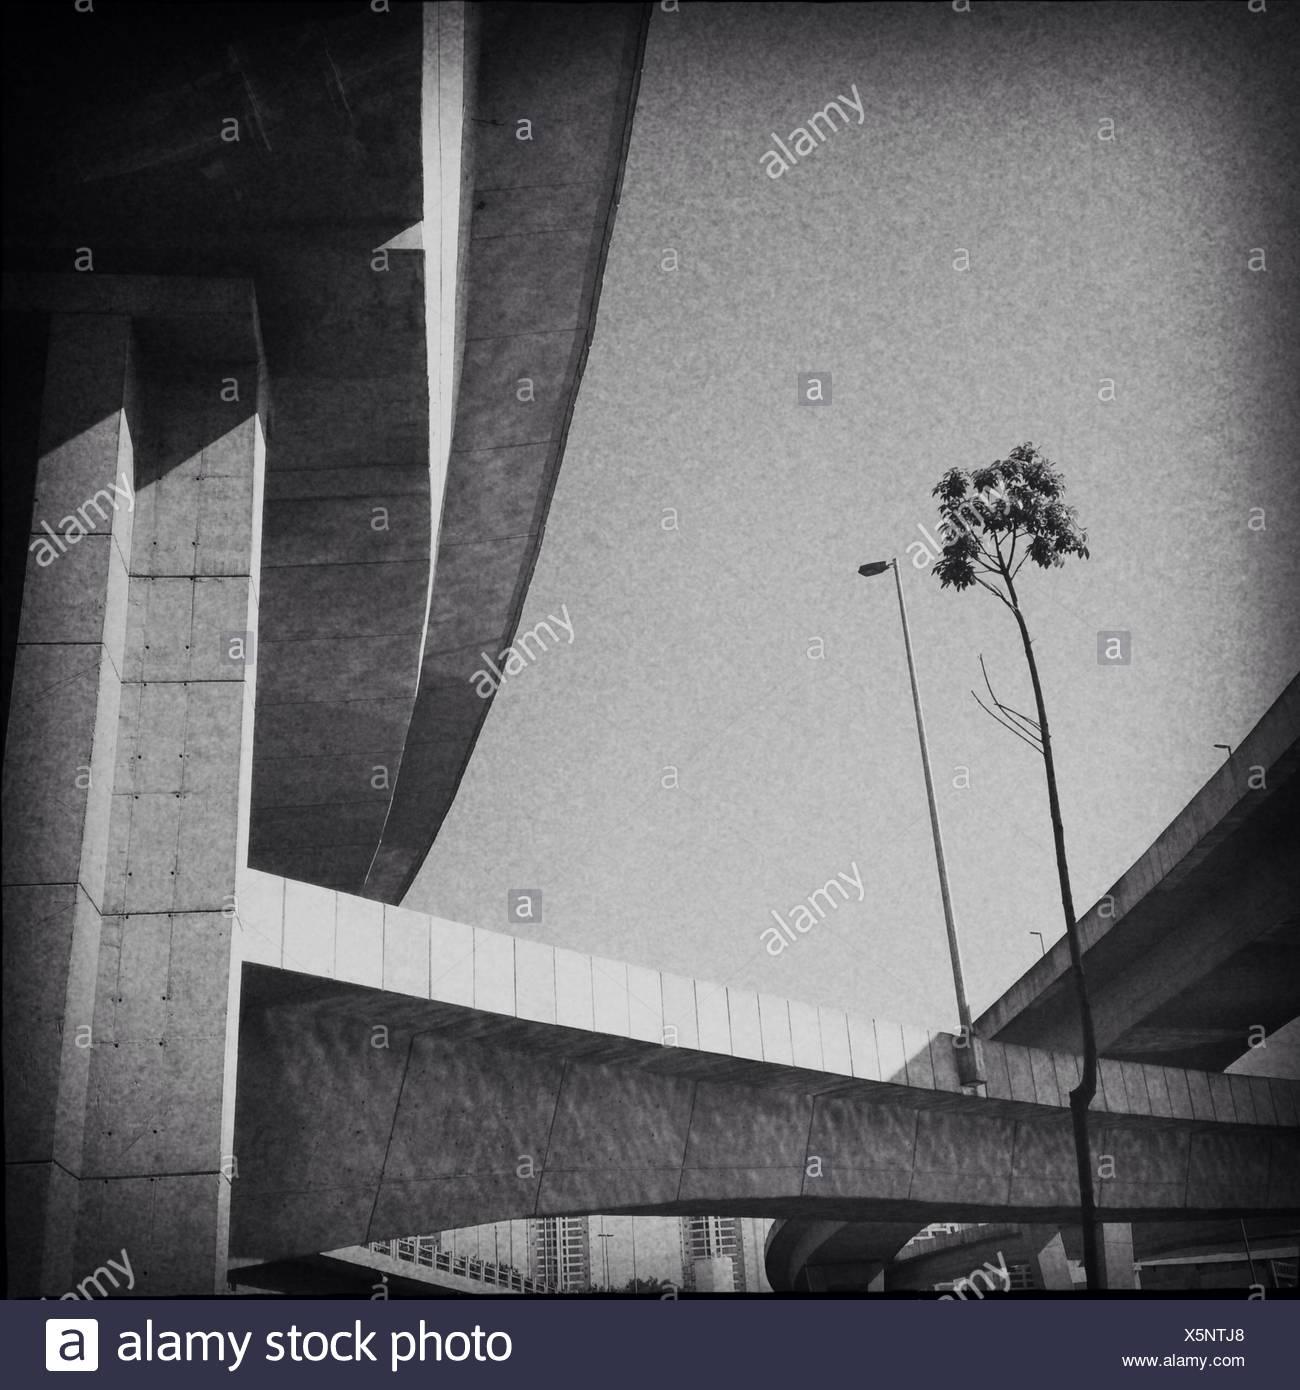 Brazil, Sao Paulo, Elevated roads - Stock Image